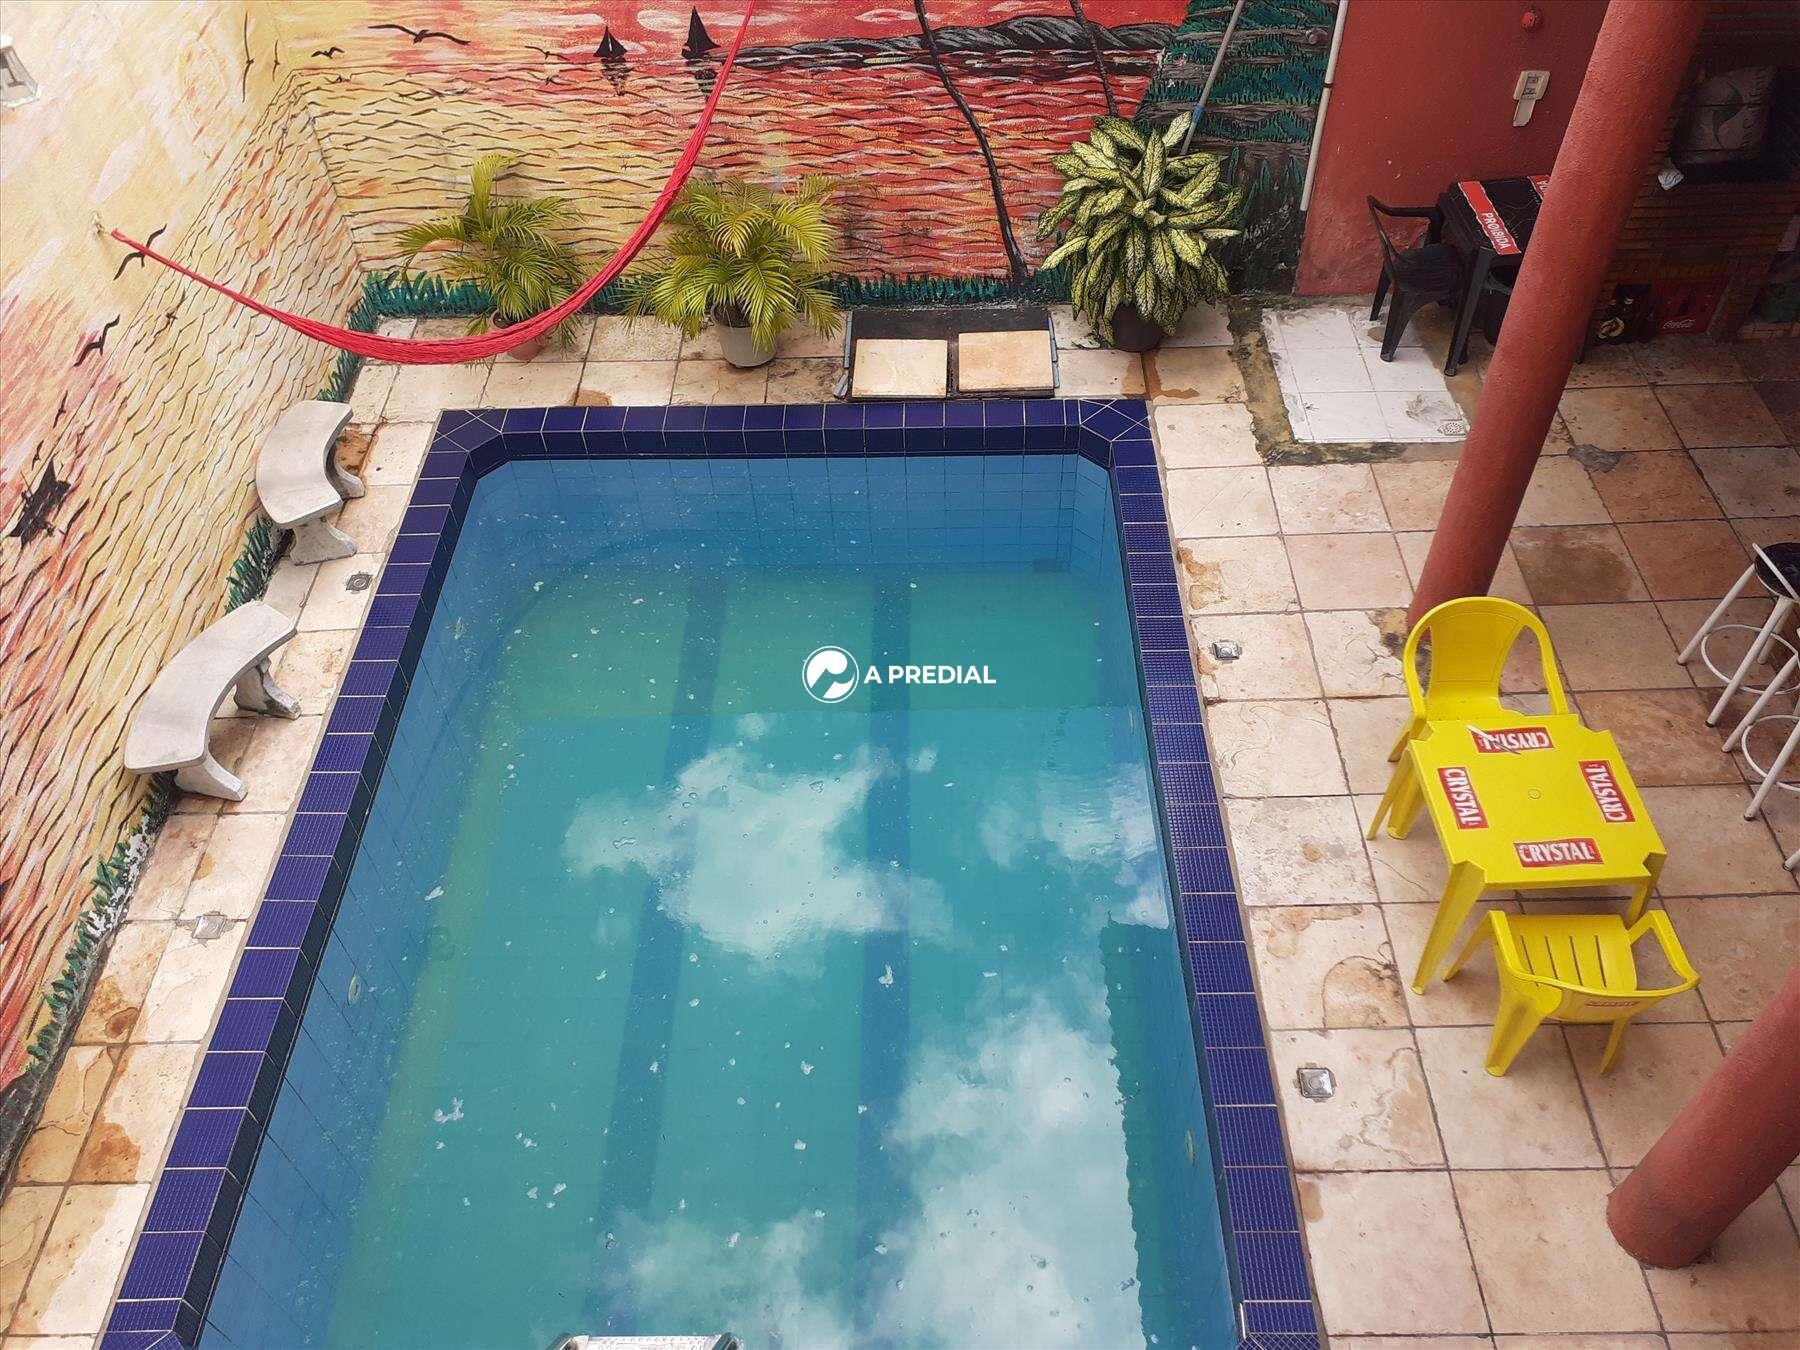 Casa à venda no Prefeito José Walter: a618148d-f-20200718_121116.jpg